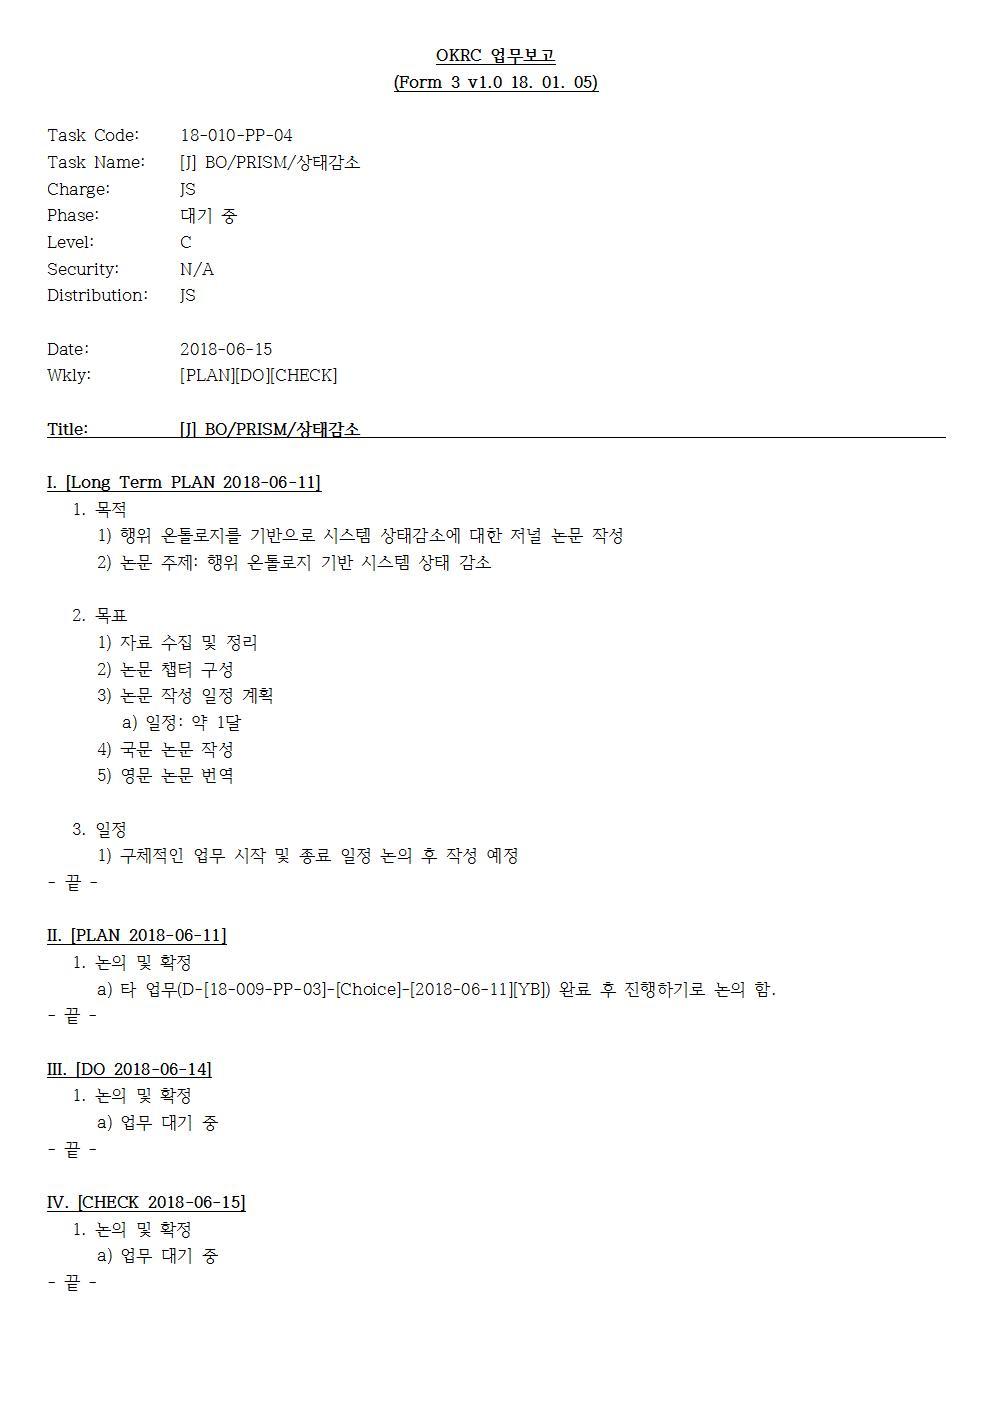 D-[18-010-PP-04]-[J-BO-PRISM-State-minimization]-[2018-06-15][JS]001.jpg